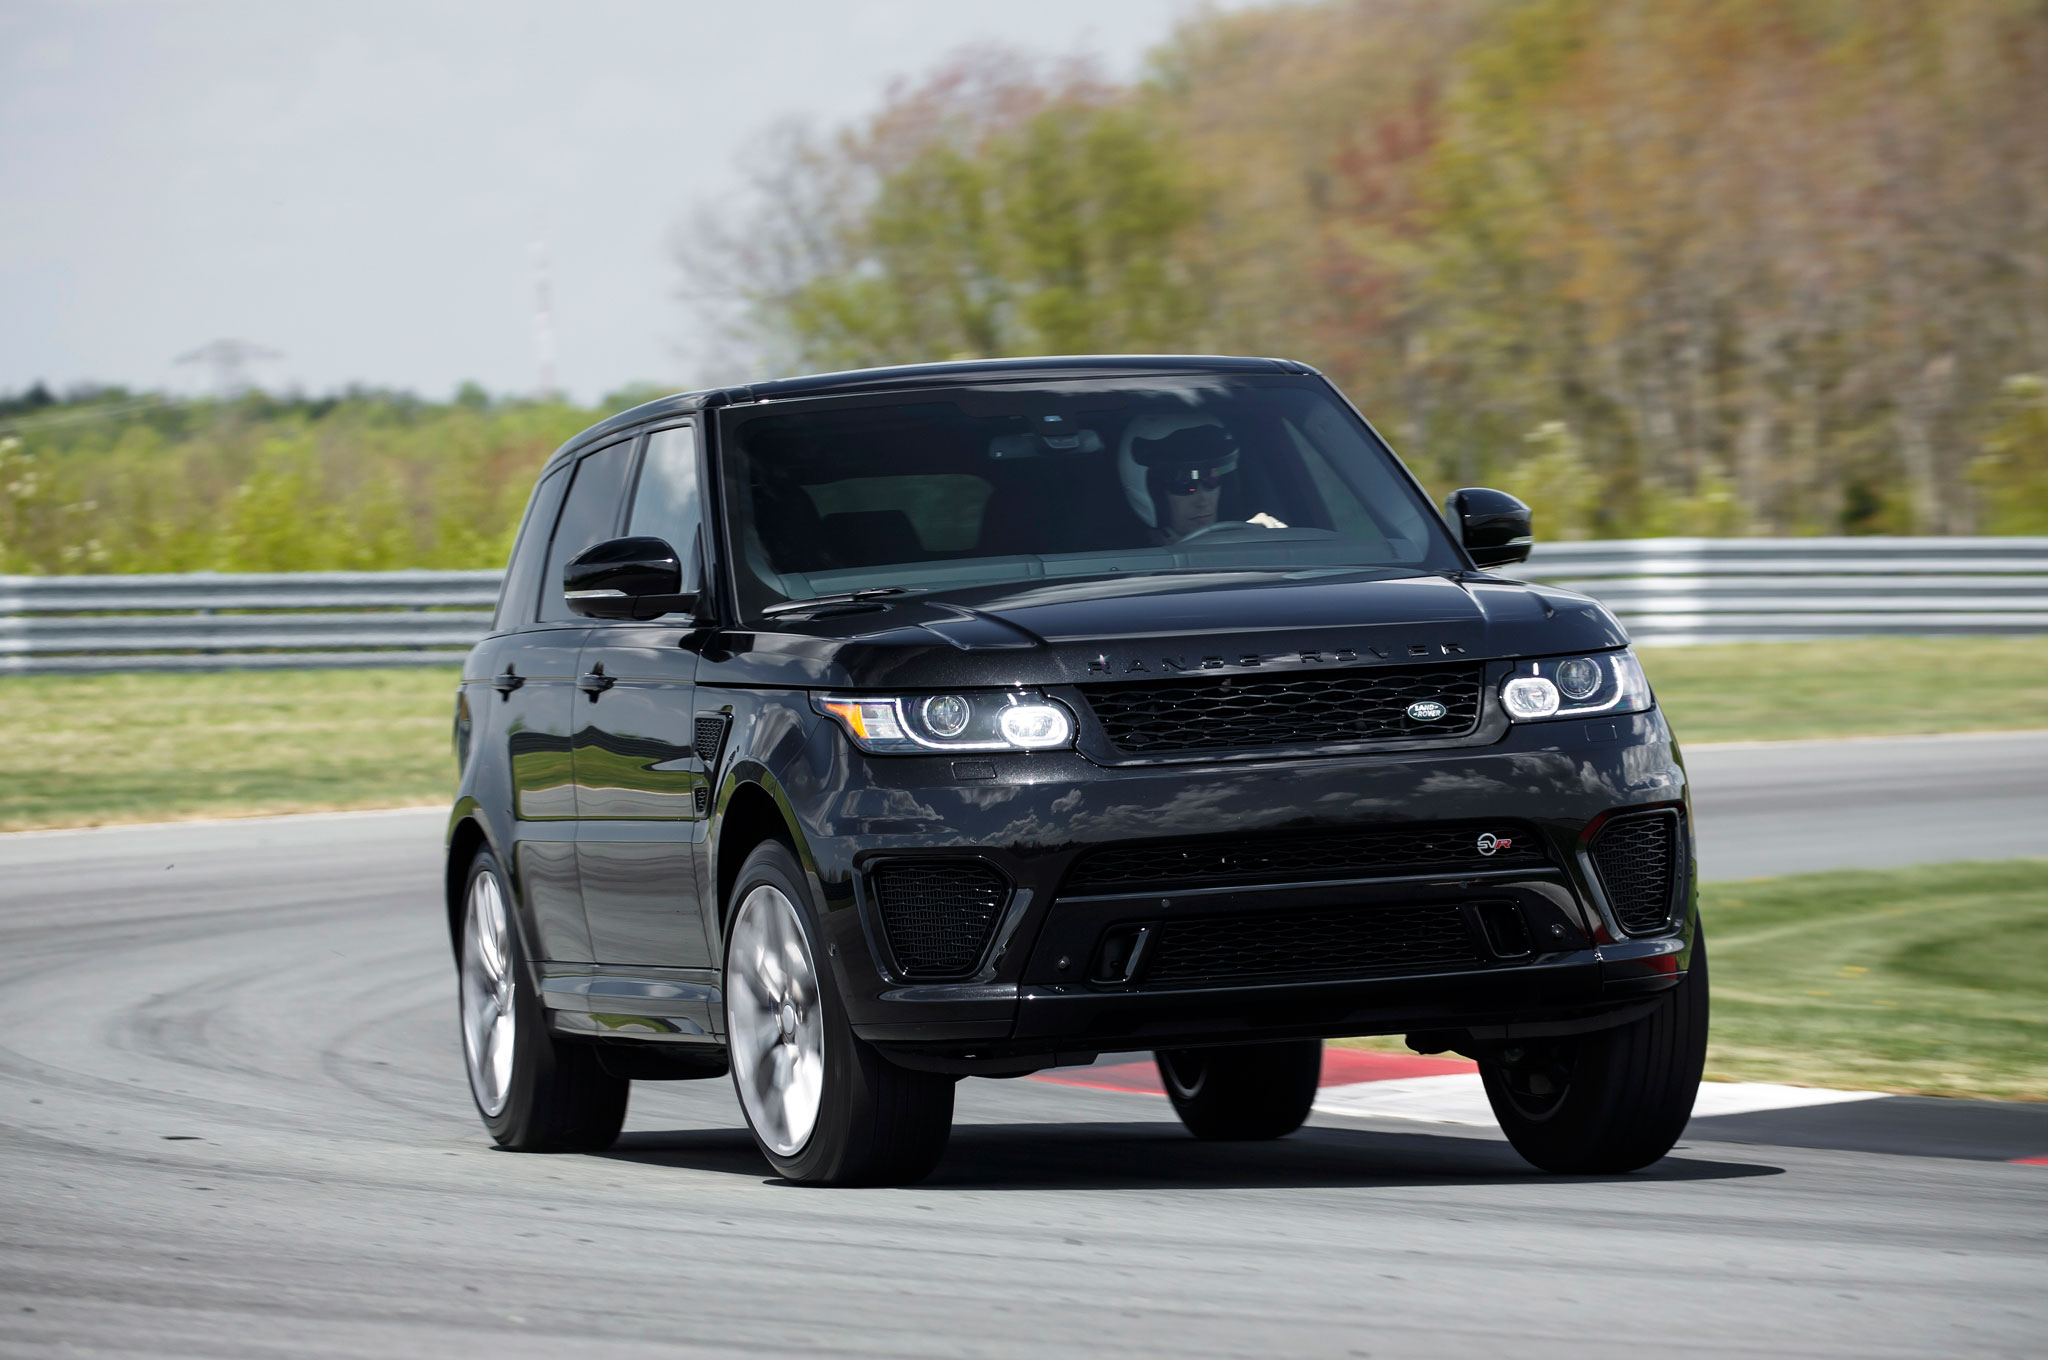 http://st.automobilemag.com/uploads/sites/11/2015/05/2015-Land-Rover-Range-Rover-Sport-SVR-front-three-quarter-in-motion-07.jpg